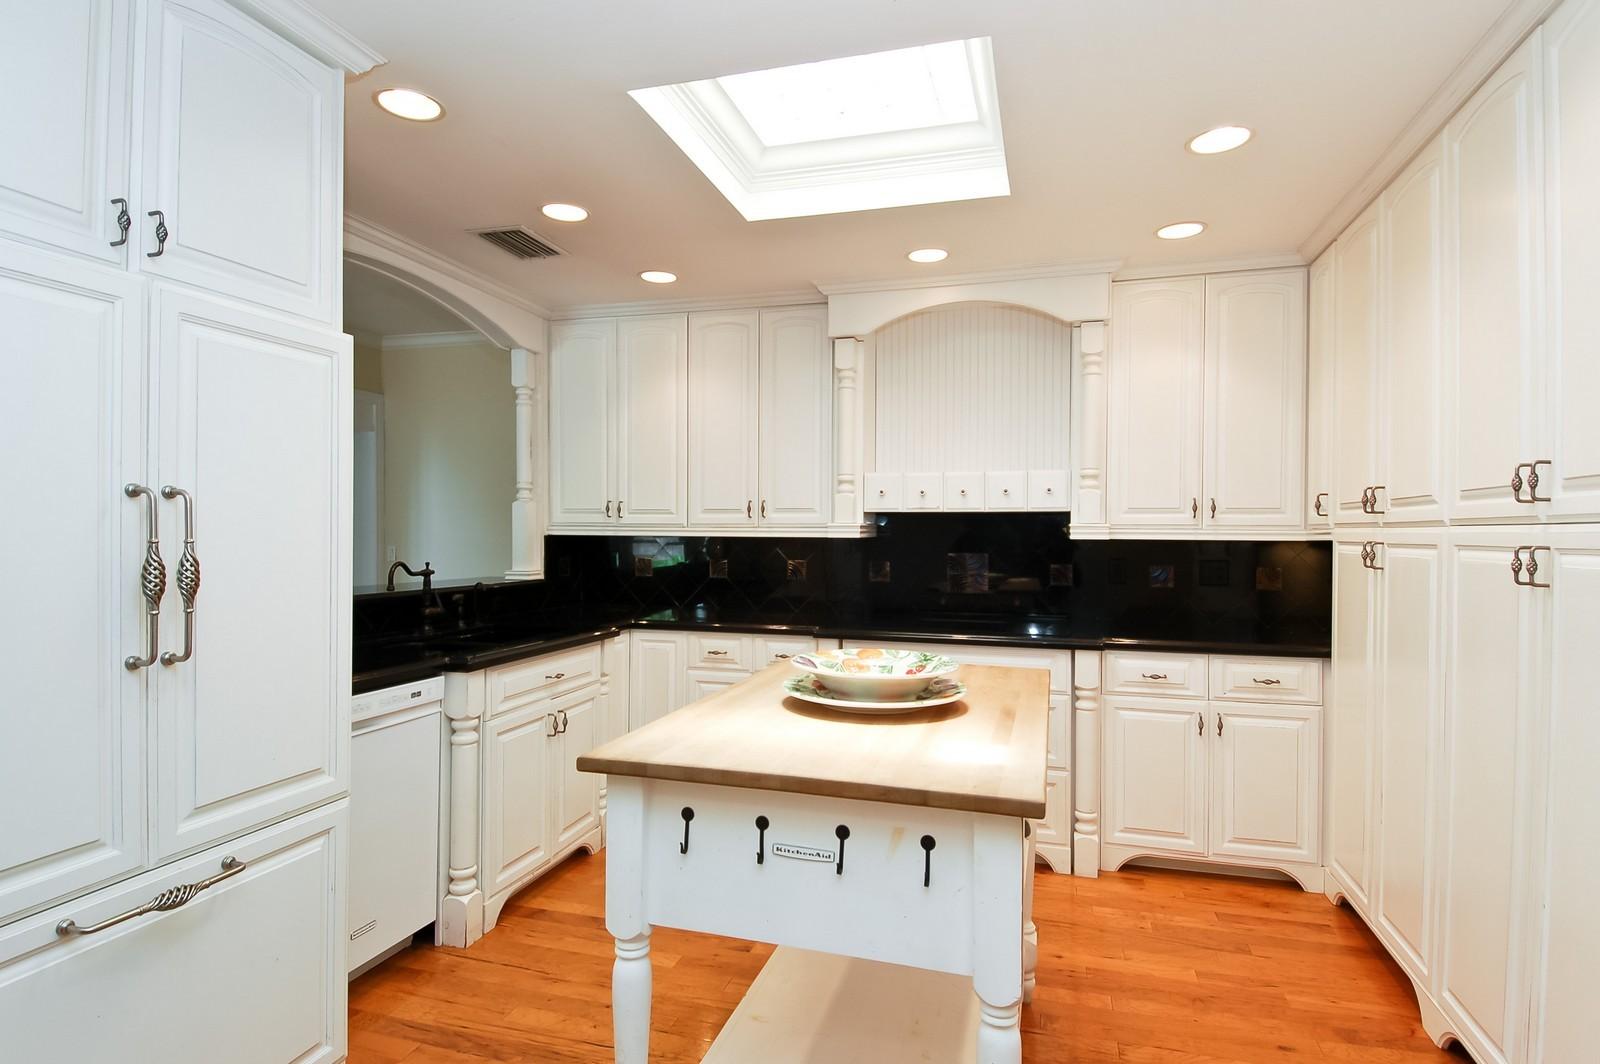 Real Estate Photography - 899 Azalea St, Boca Raton, FL, 33486 - Kitchen